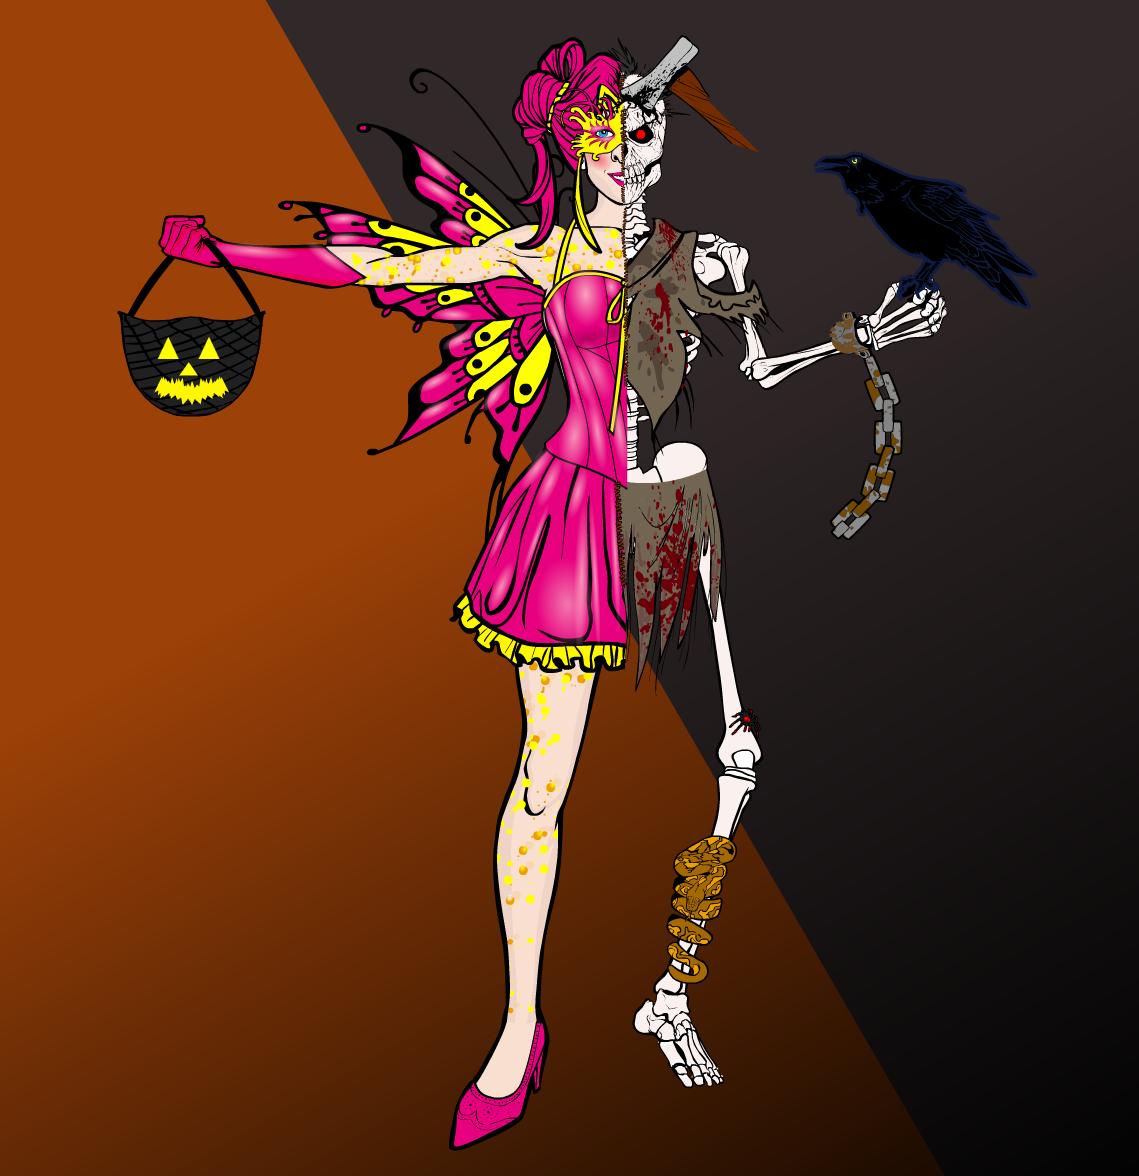 Character Design Challenge #343 – The Spirit of Halloween – Results